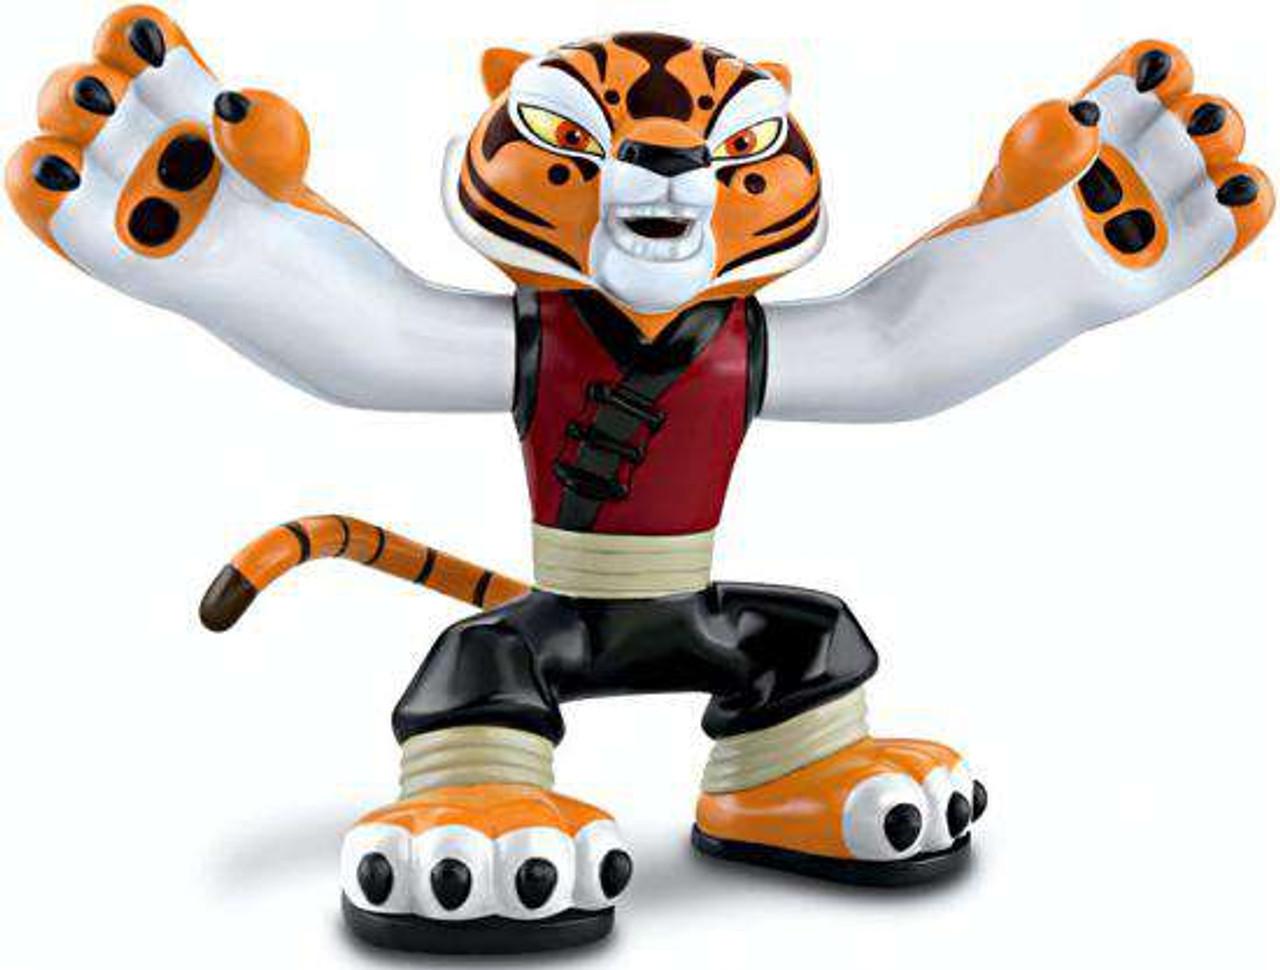 Kung Fu Panda Tigress Action Figure by EmmyKirk14 on